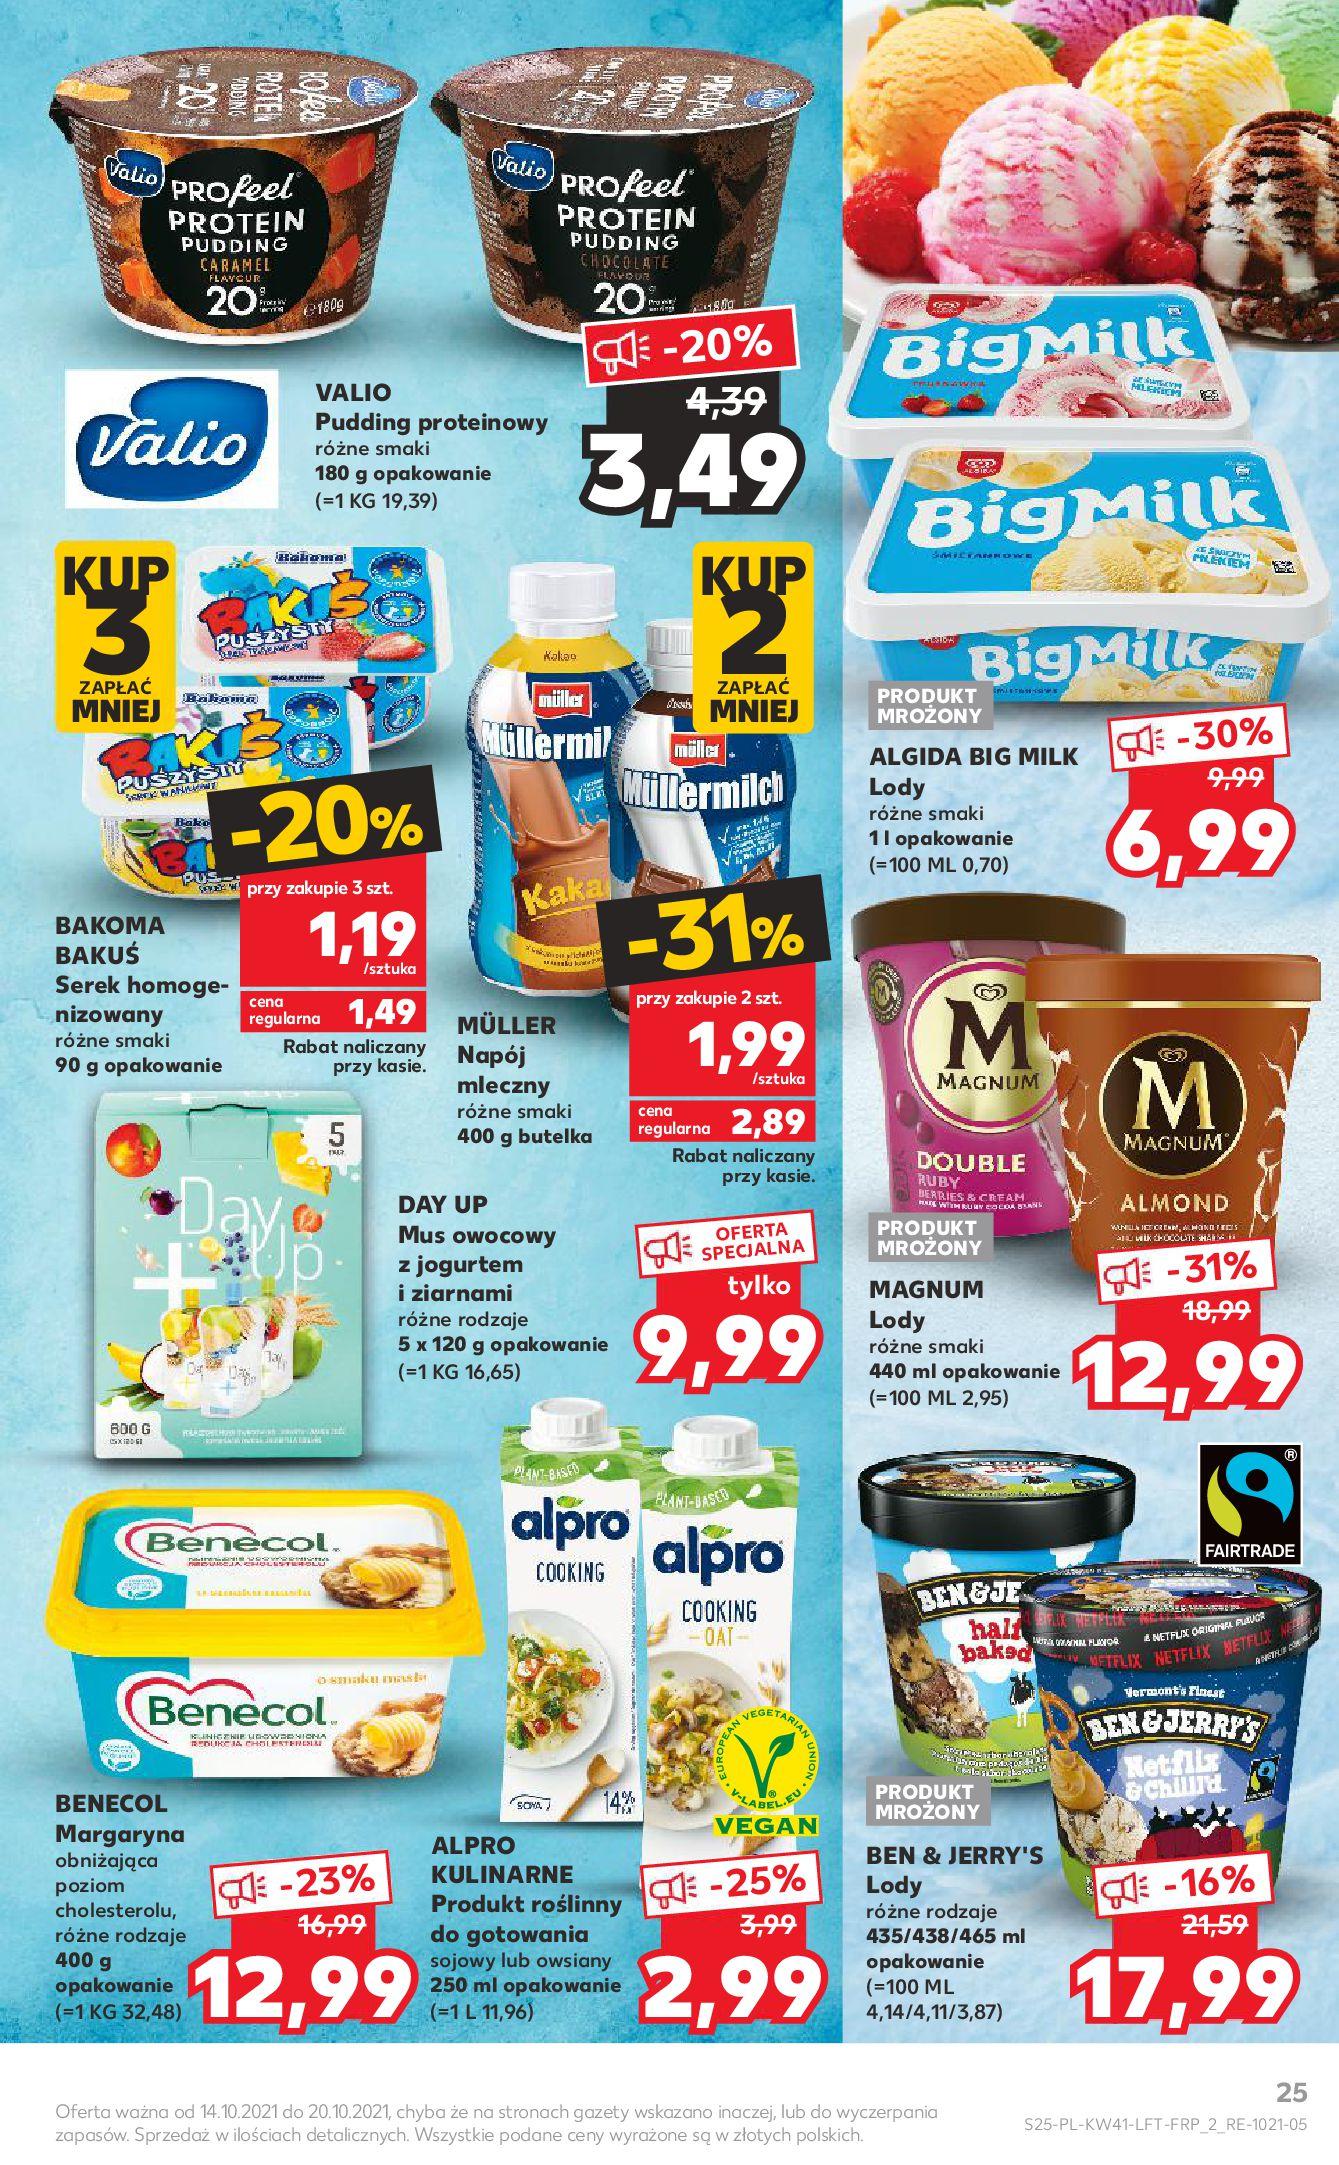 Gazetka Kaufland: Gazetka Kaufland 14-20.10. 2021-10-14 page-25